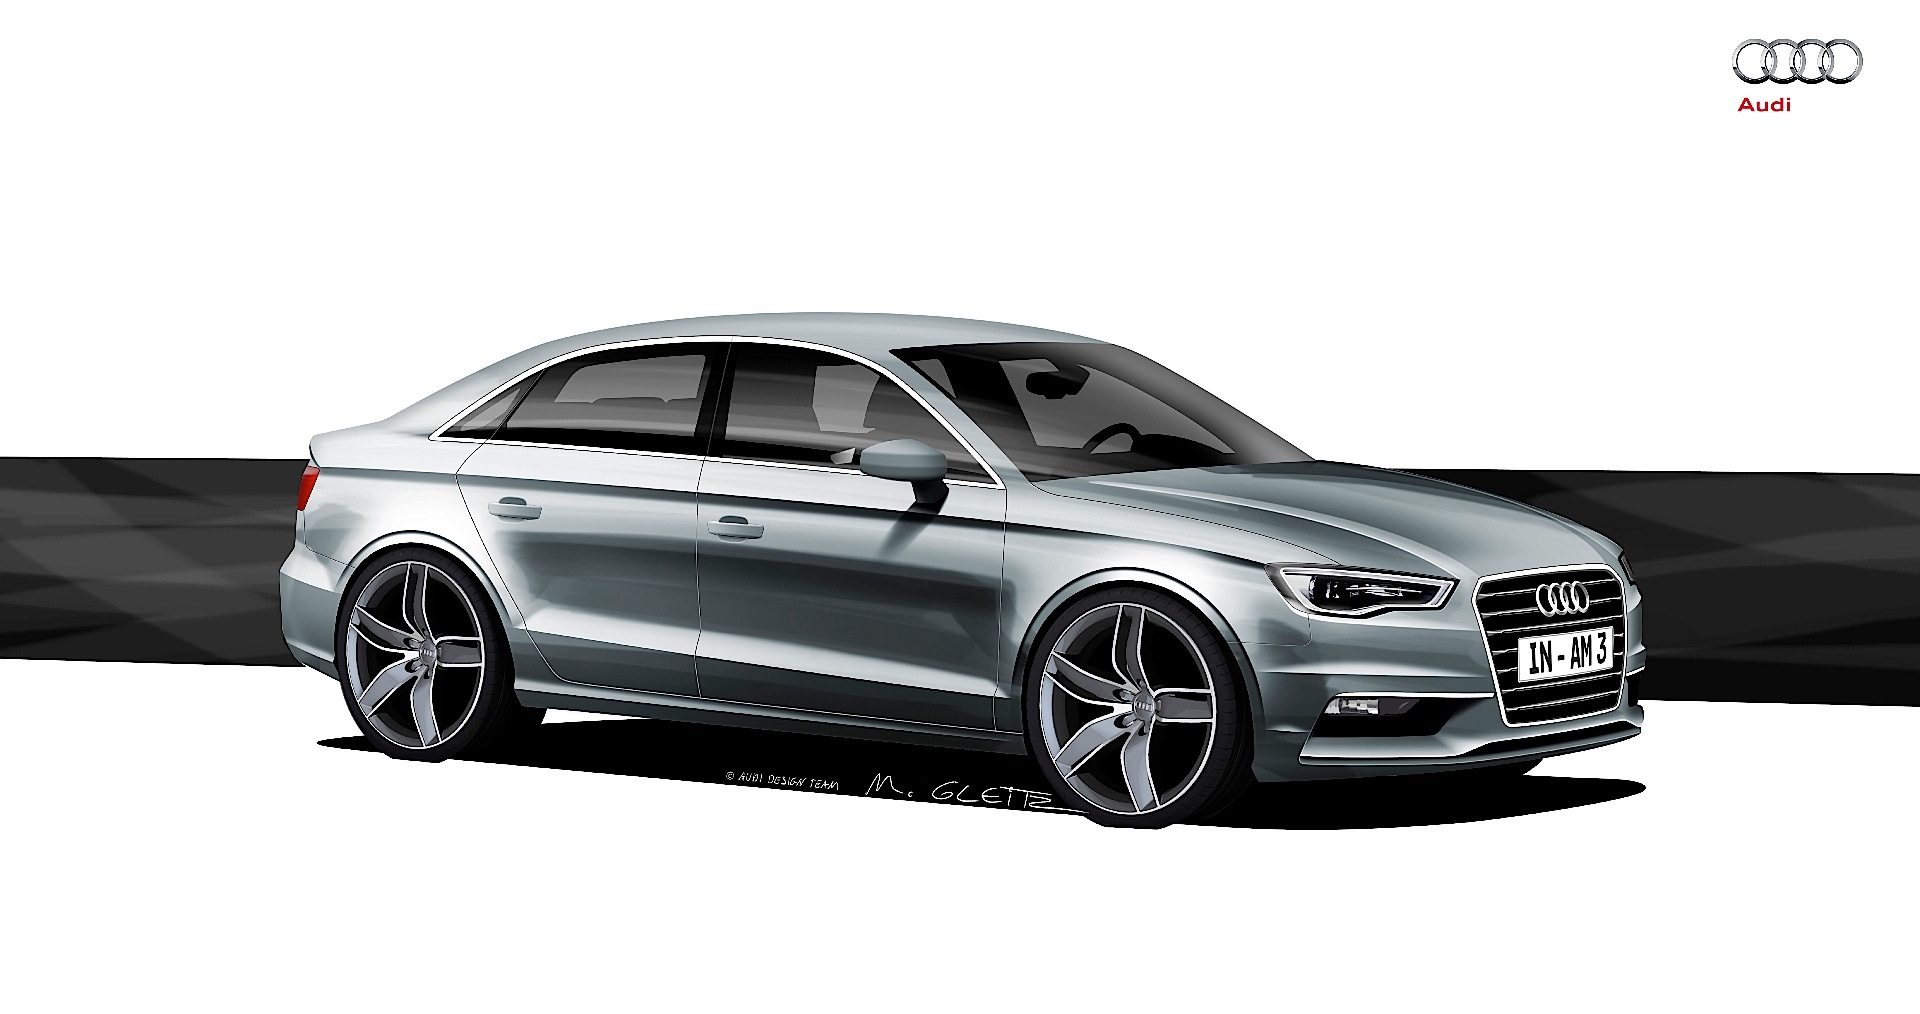 AUDI A Sedan Specs Autoevolution - Audi sedan